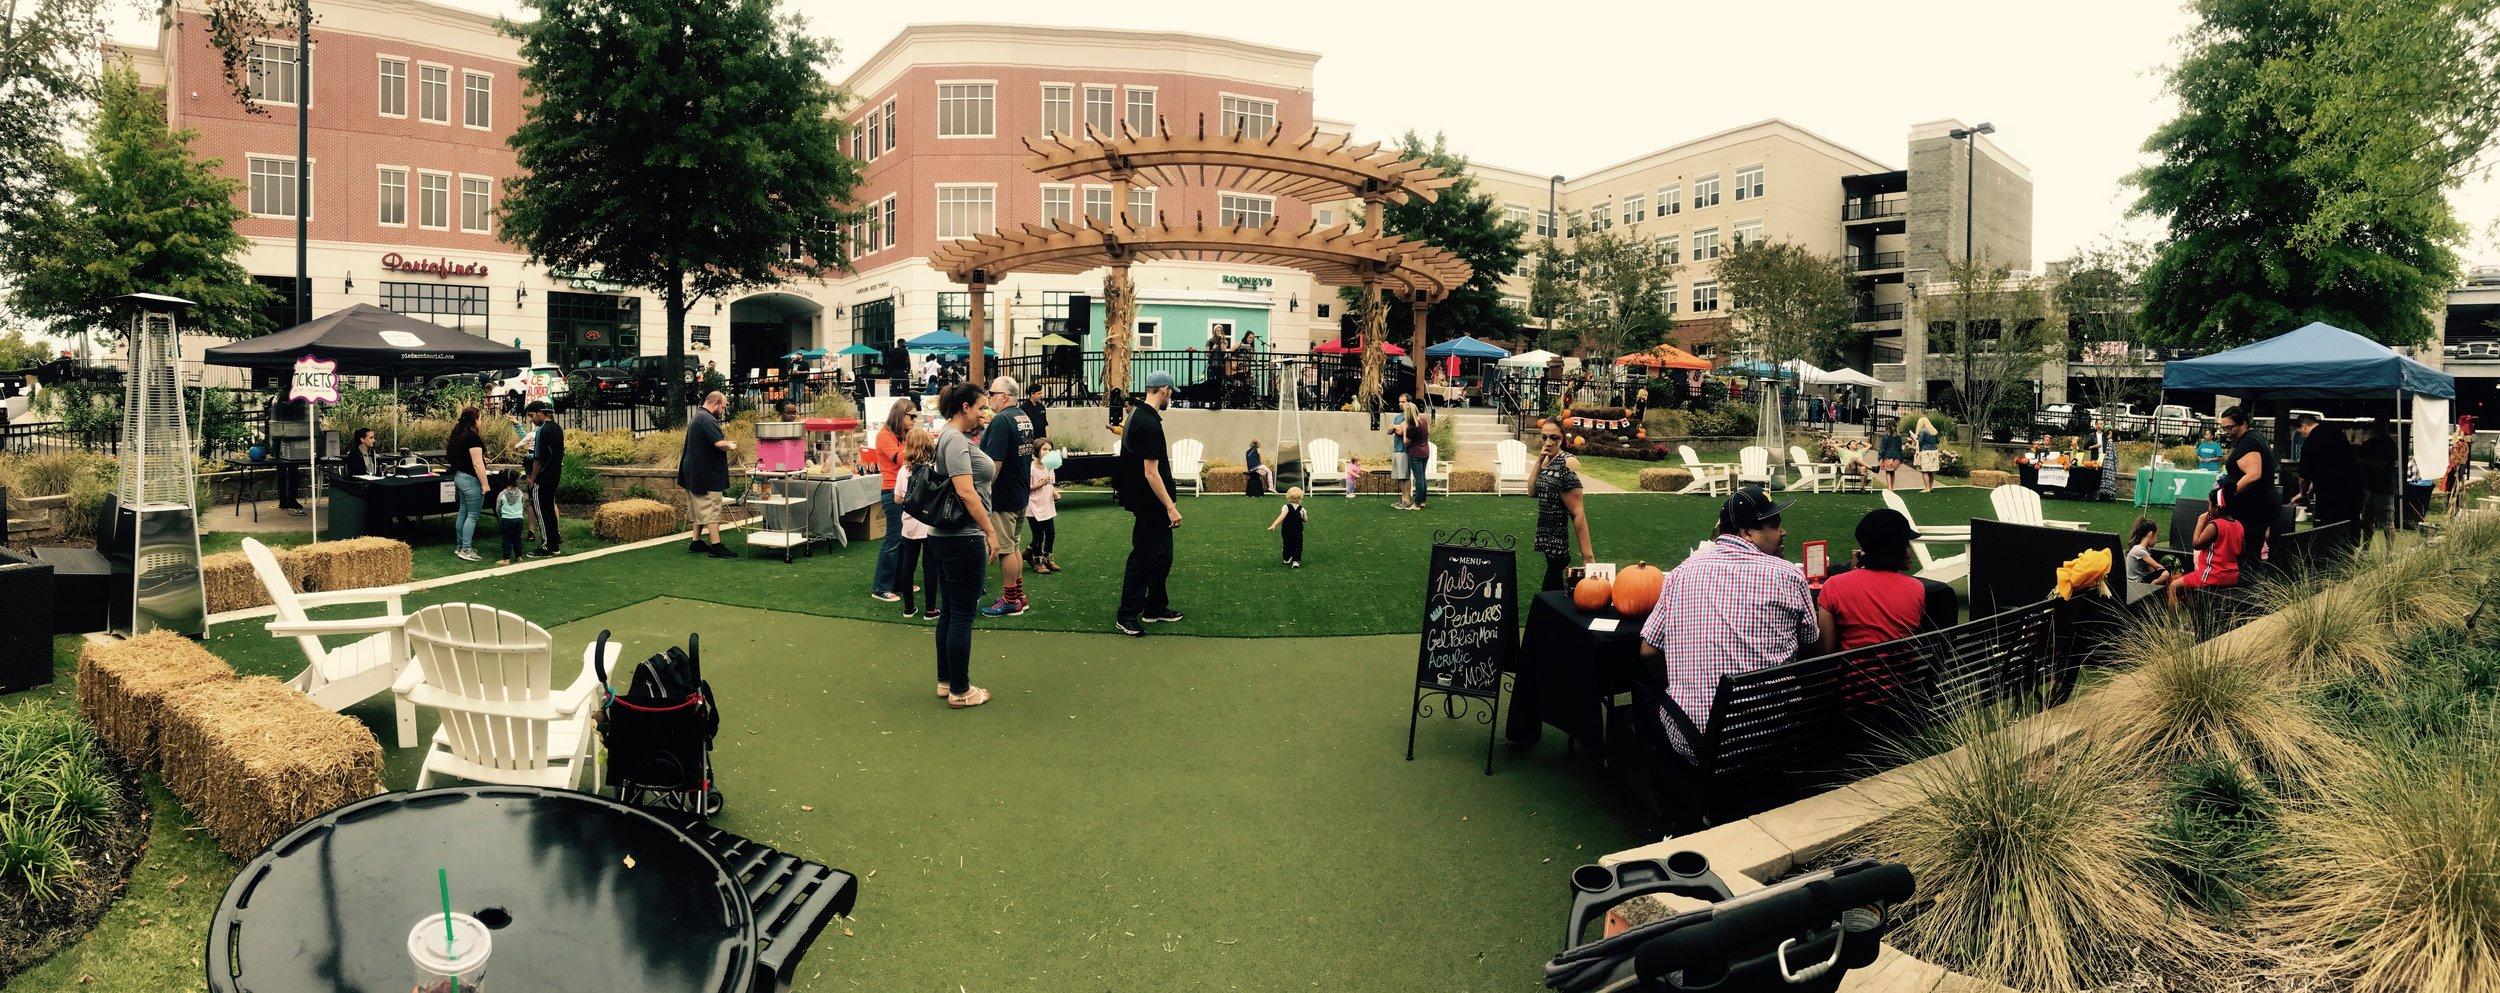 Fall Fest Event Lawn 3.jpg